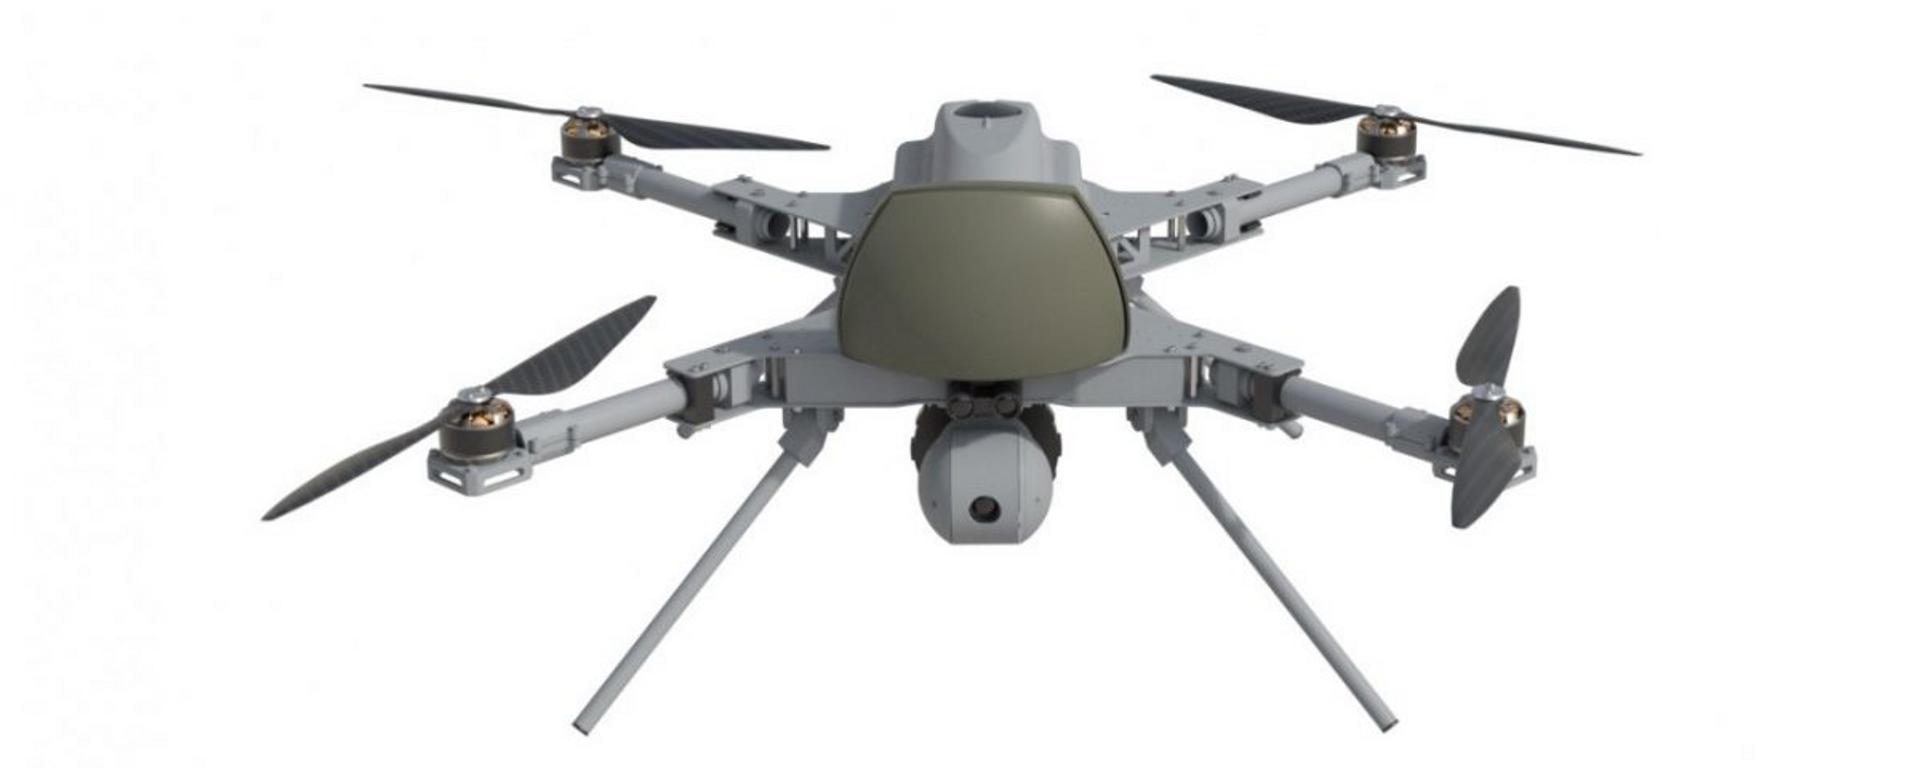 Drone da combattimento turco Kargu - Sputnik Italia, 1920, 26.07.2021